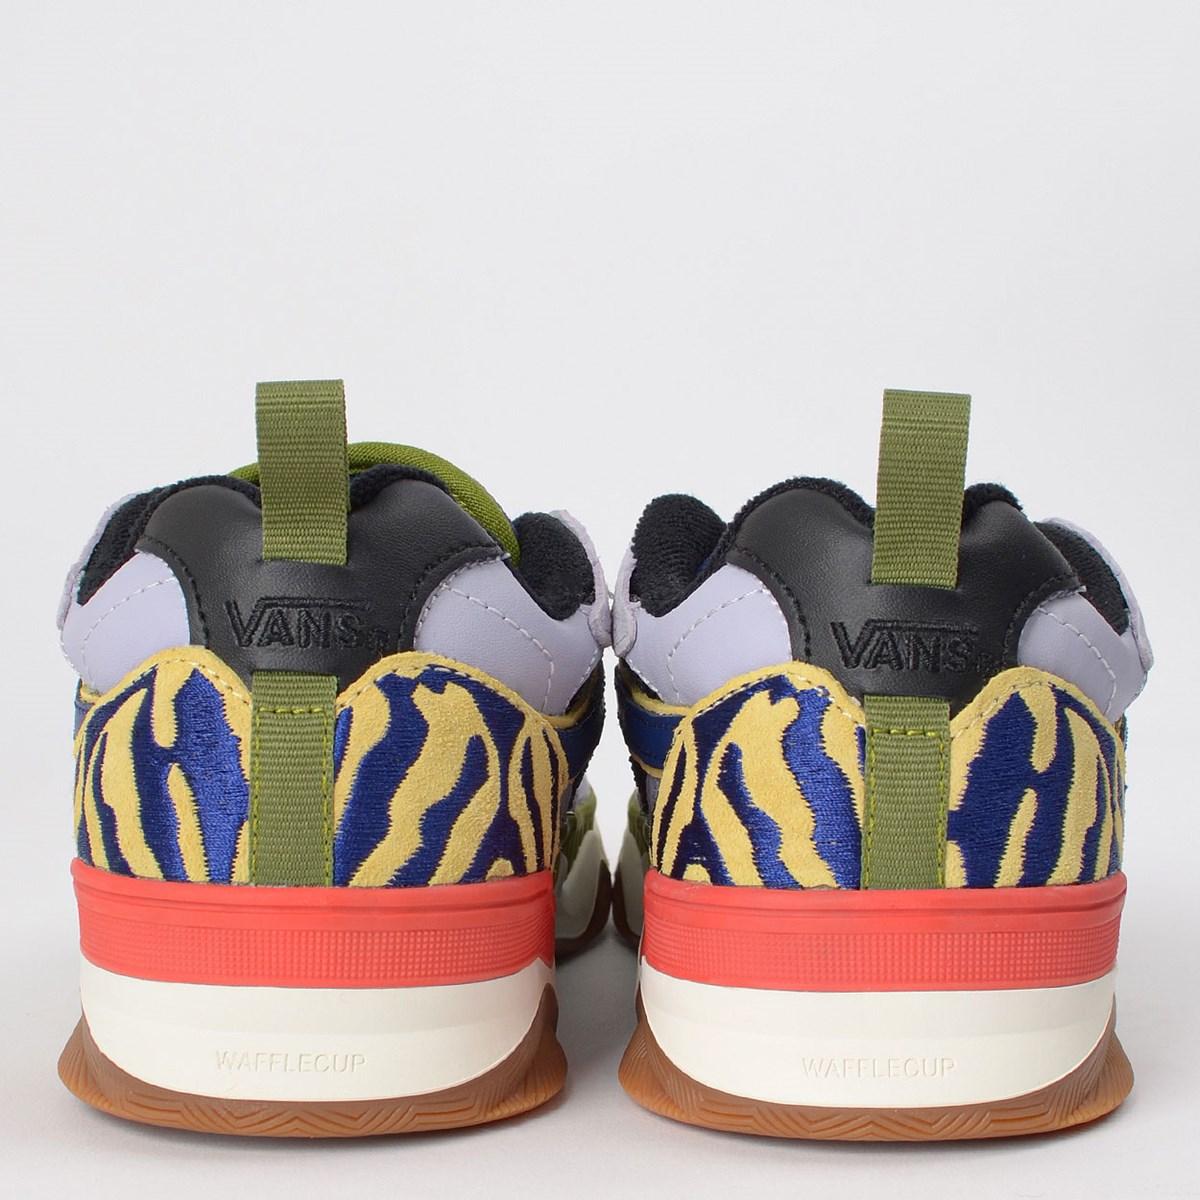 Tênis Vans Brux WC Bugs Lavender Blue Print VN0A4BH4WR0